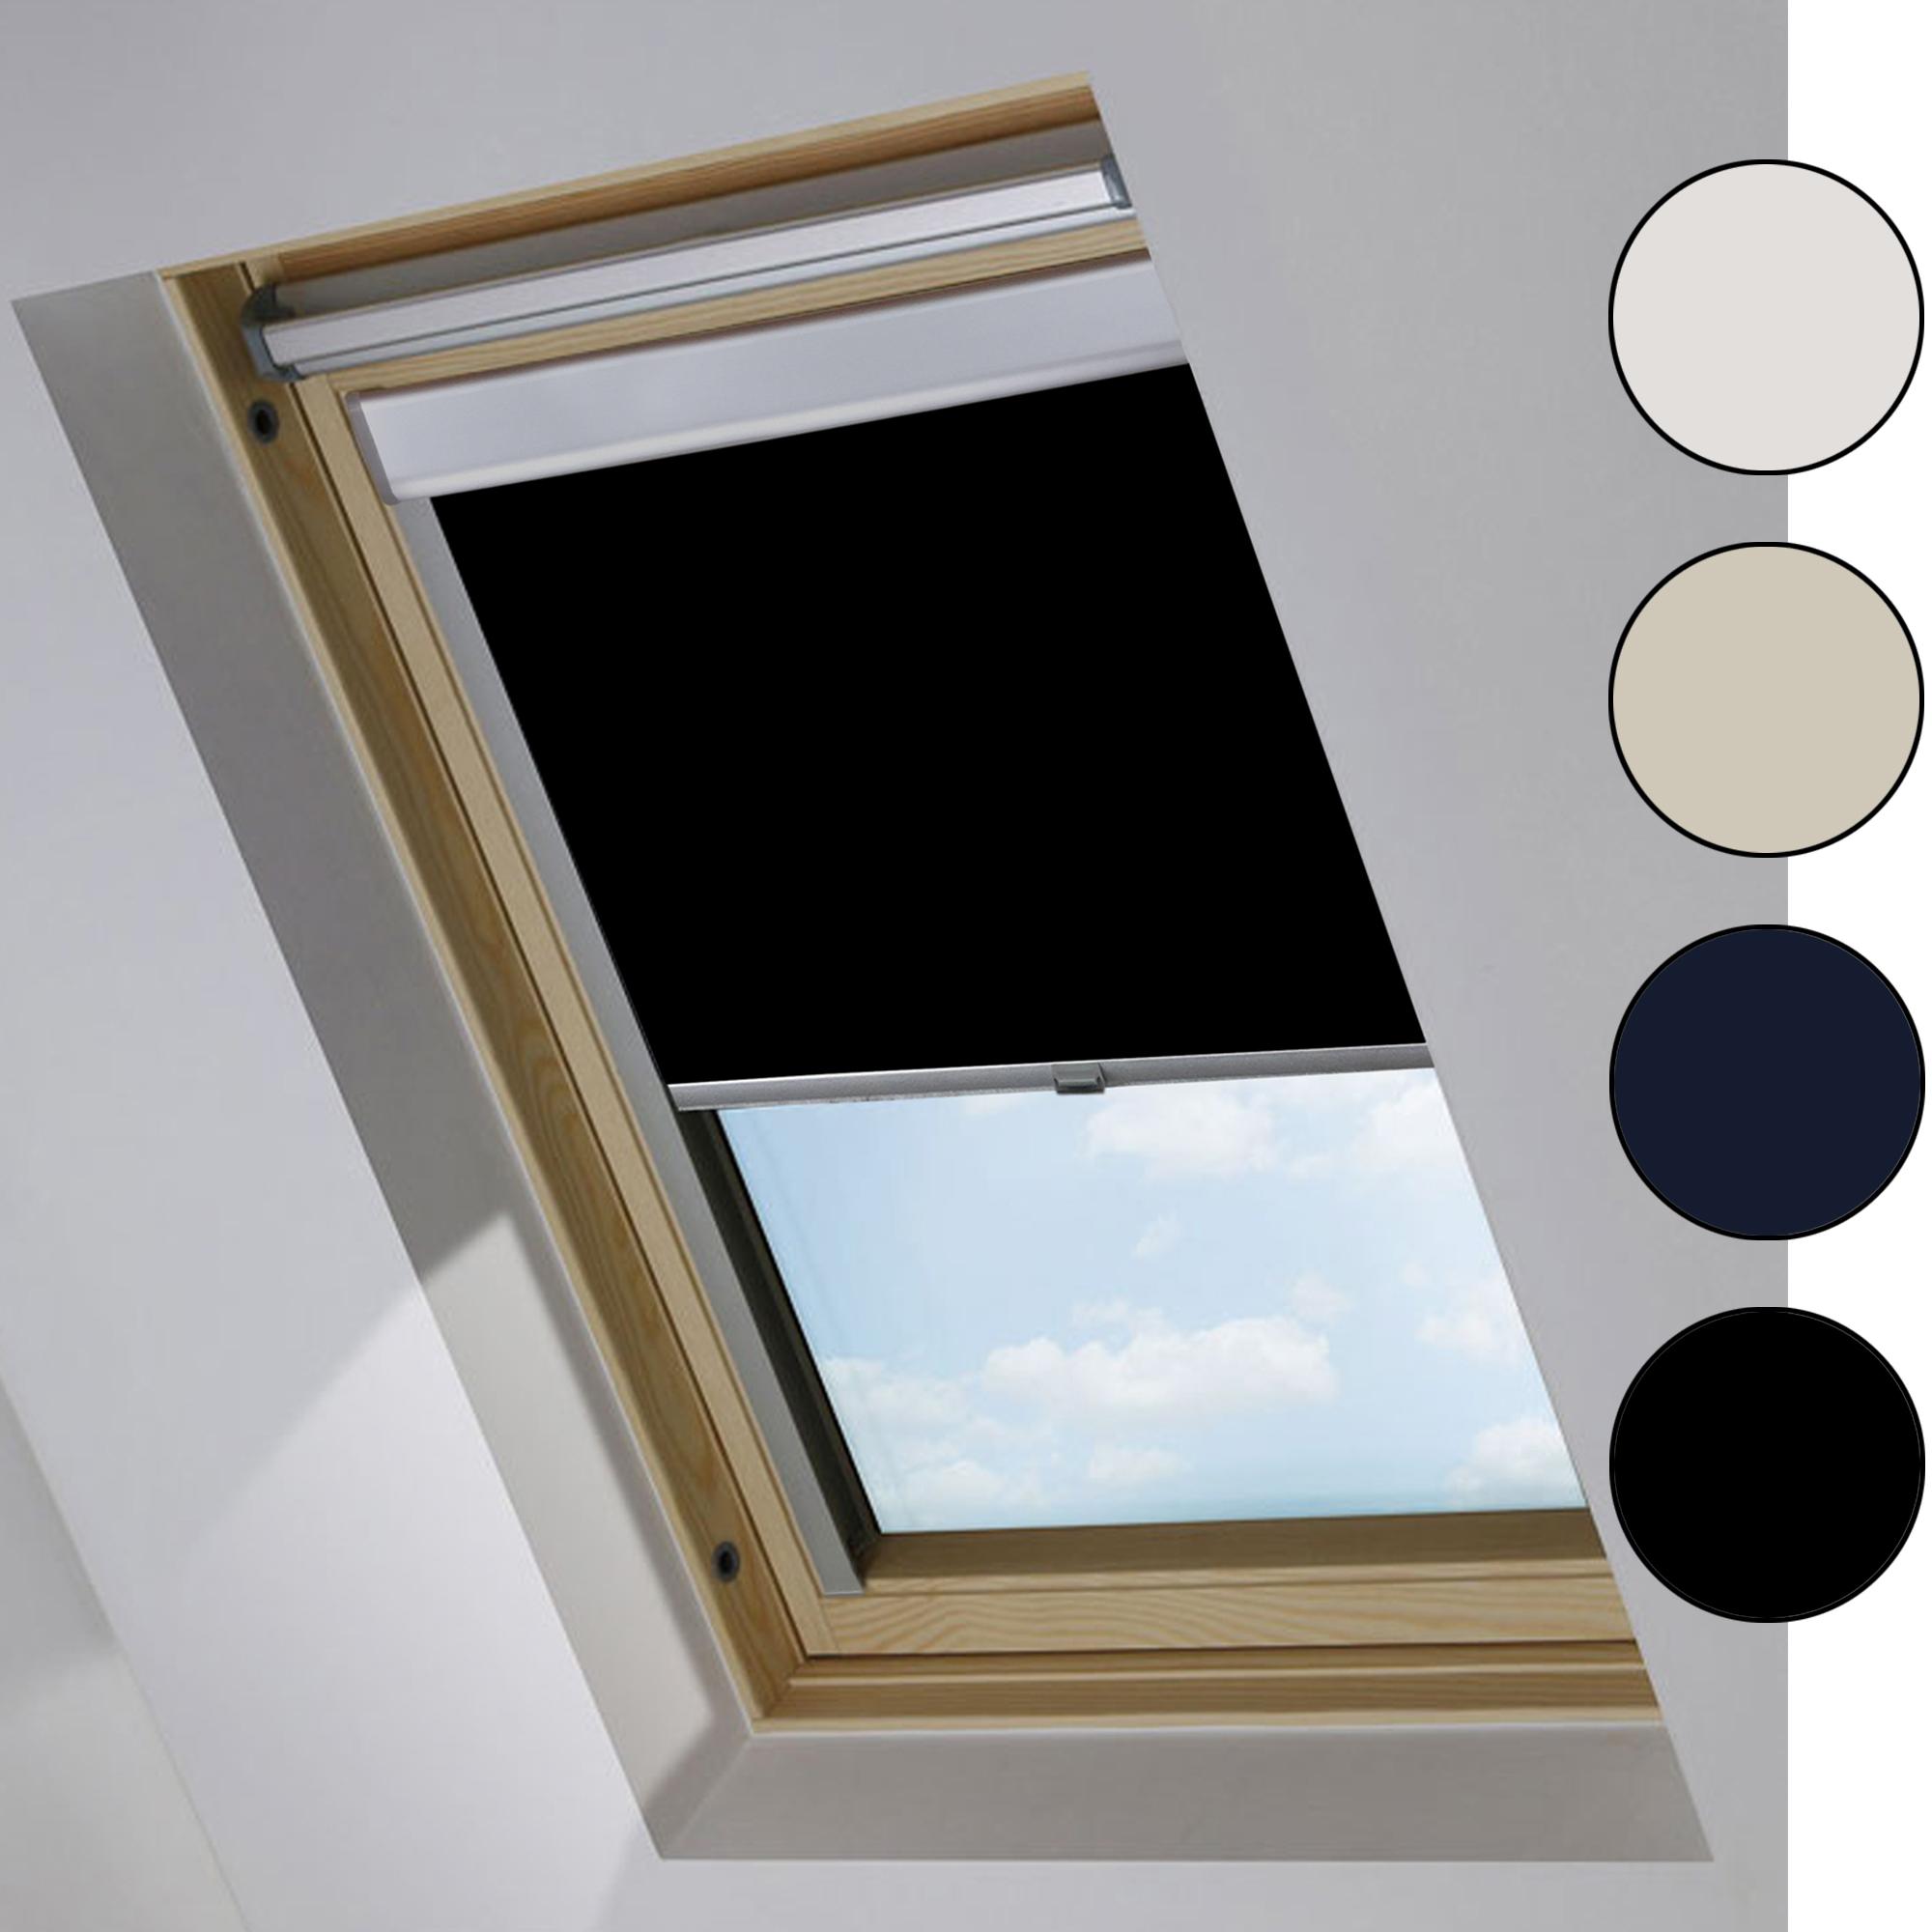 velux dachfenster rollo: rollos | ebay, Moderne